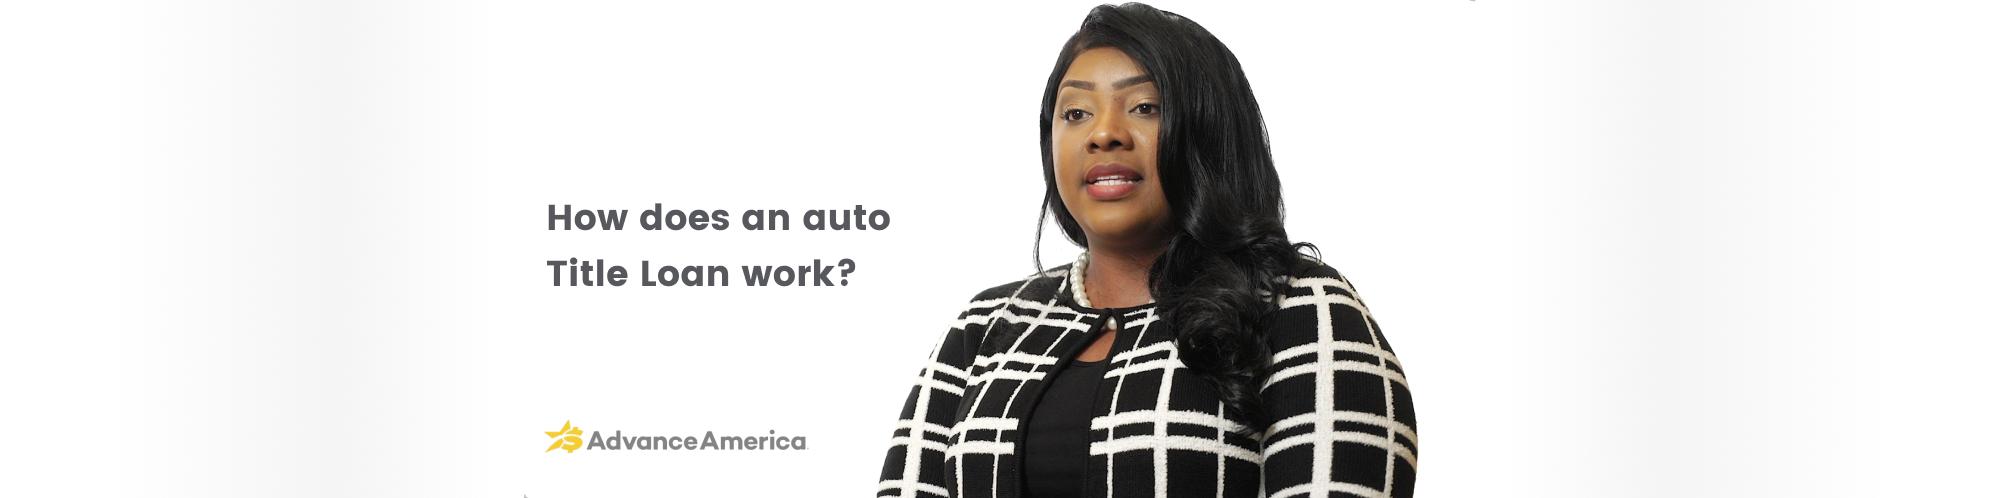 Advance America associate discusses title loans